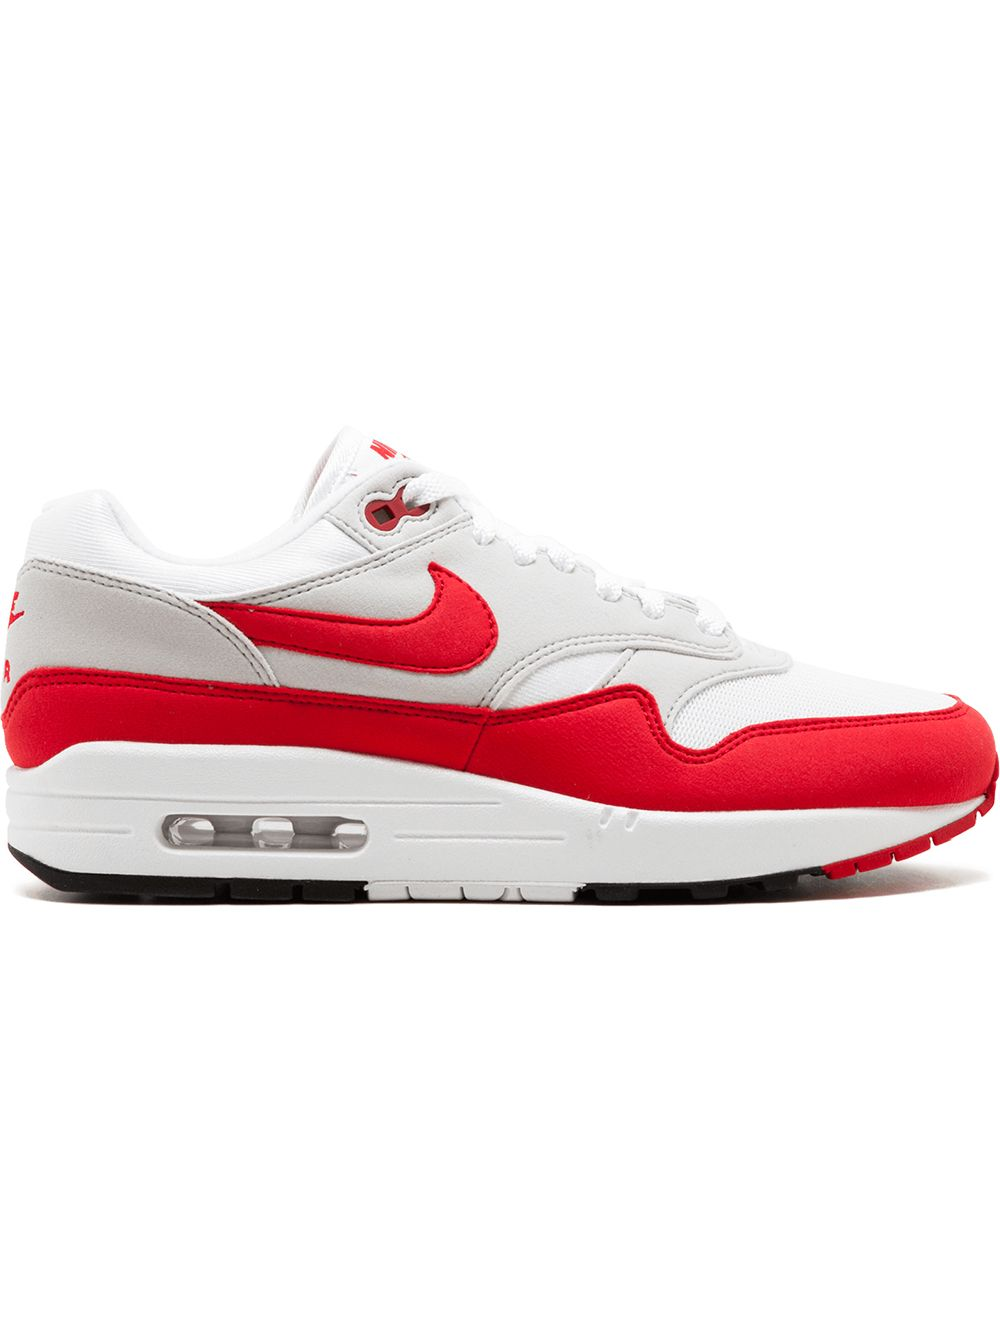 Nike Air Max 90 Essential Herren Braun River Rock Weiß 537384 132